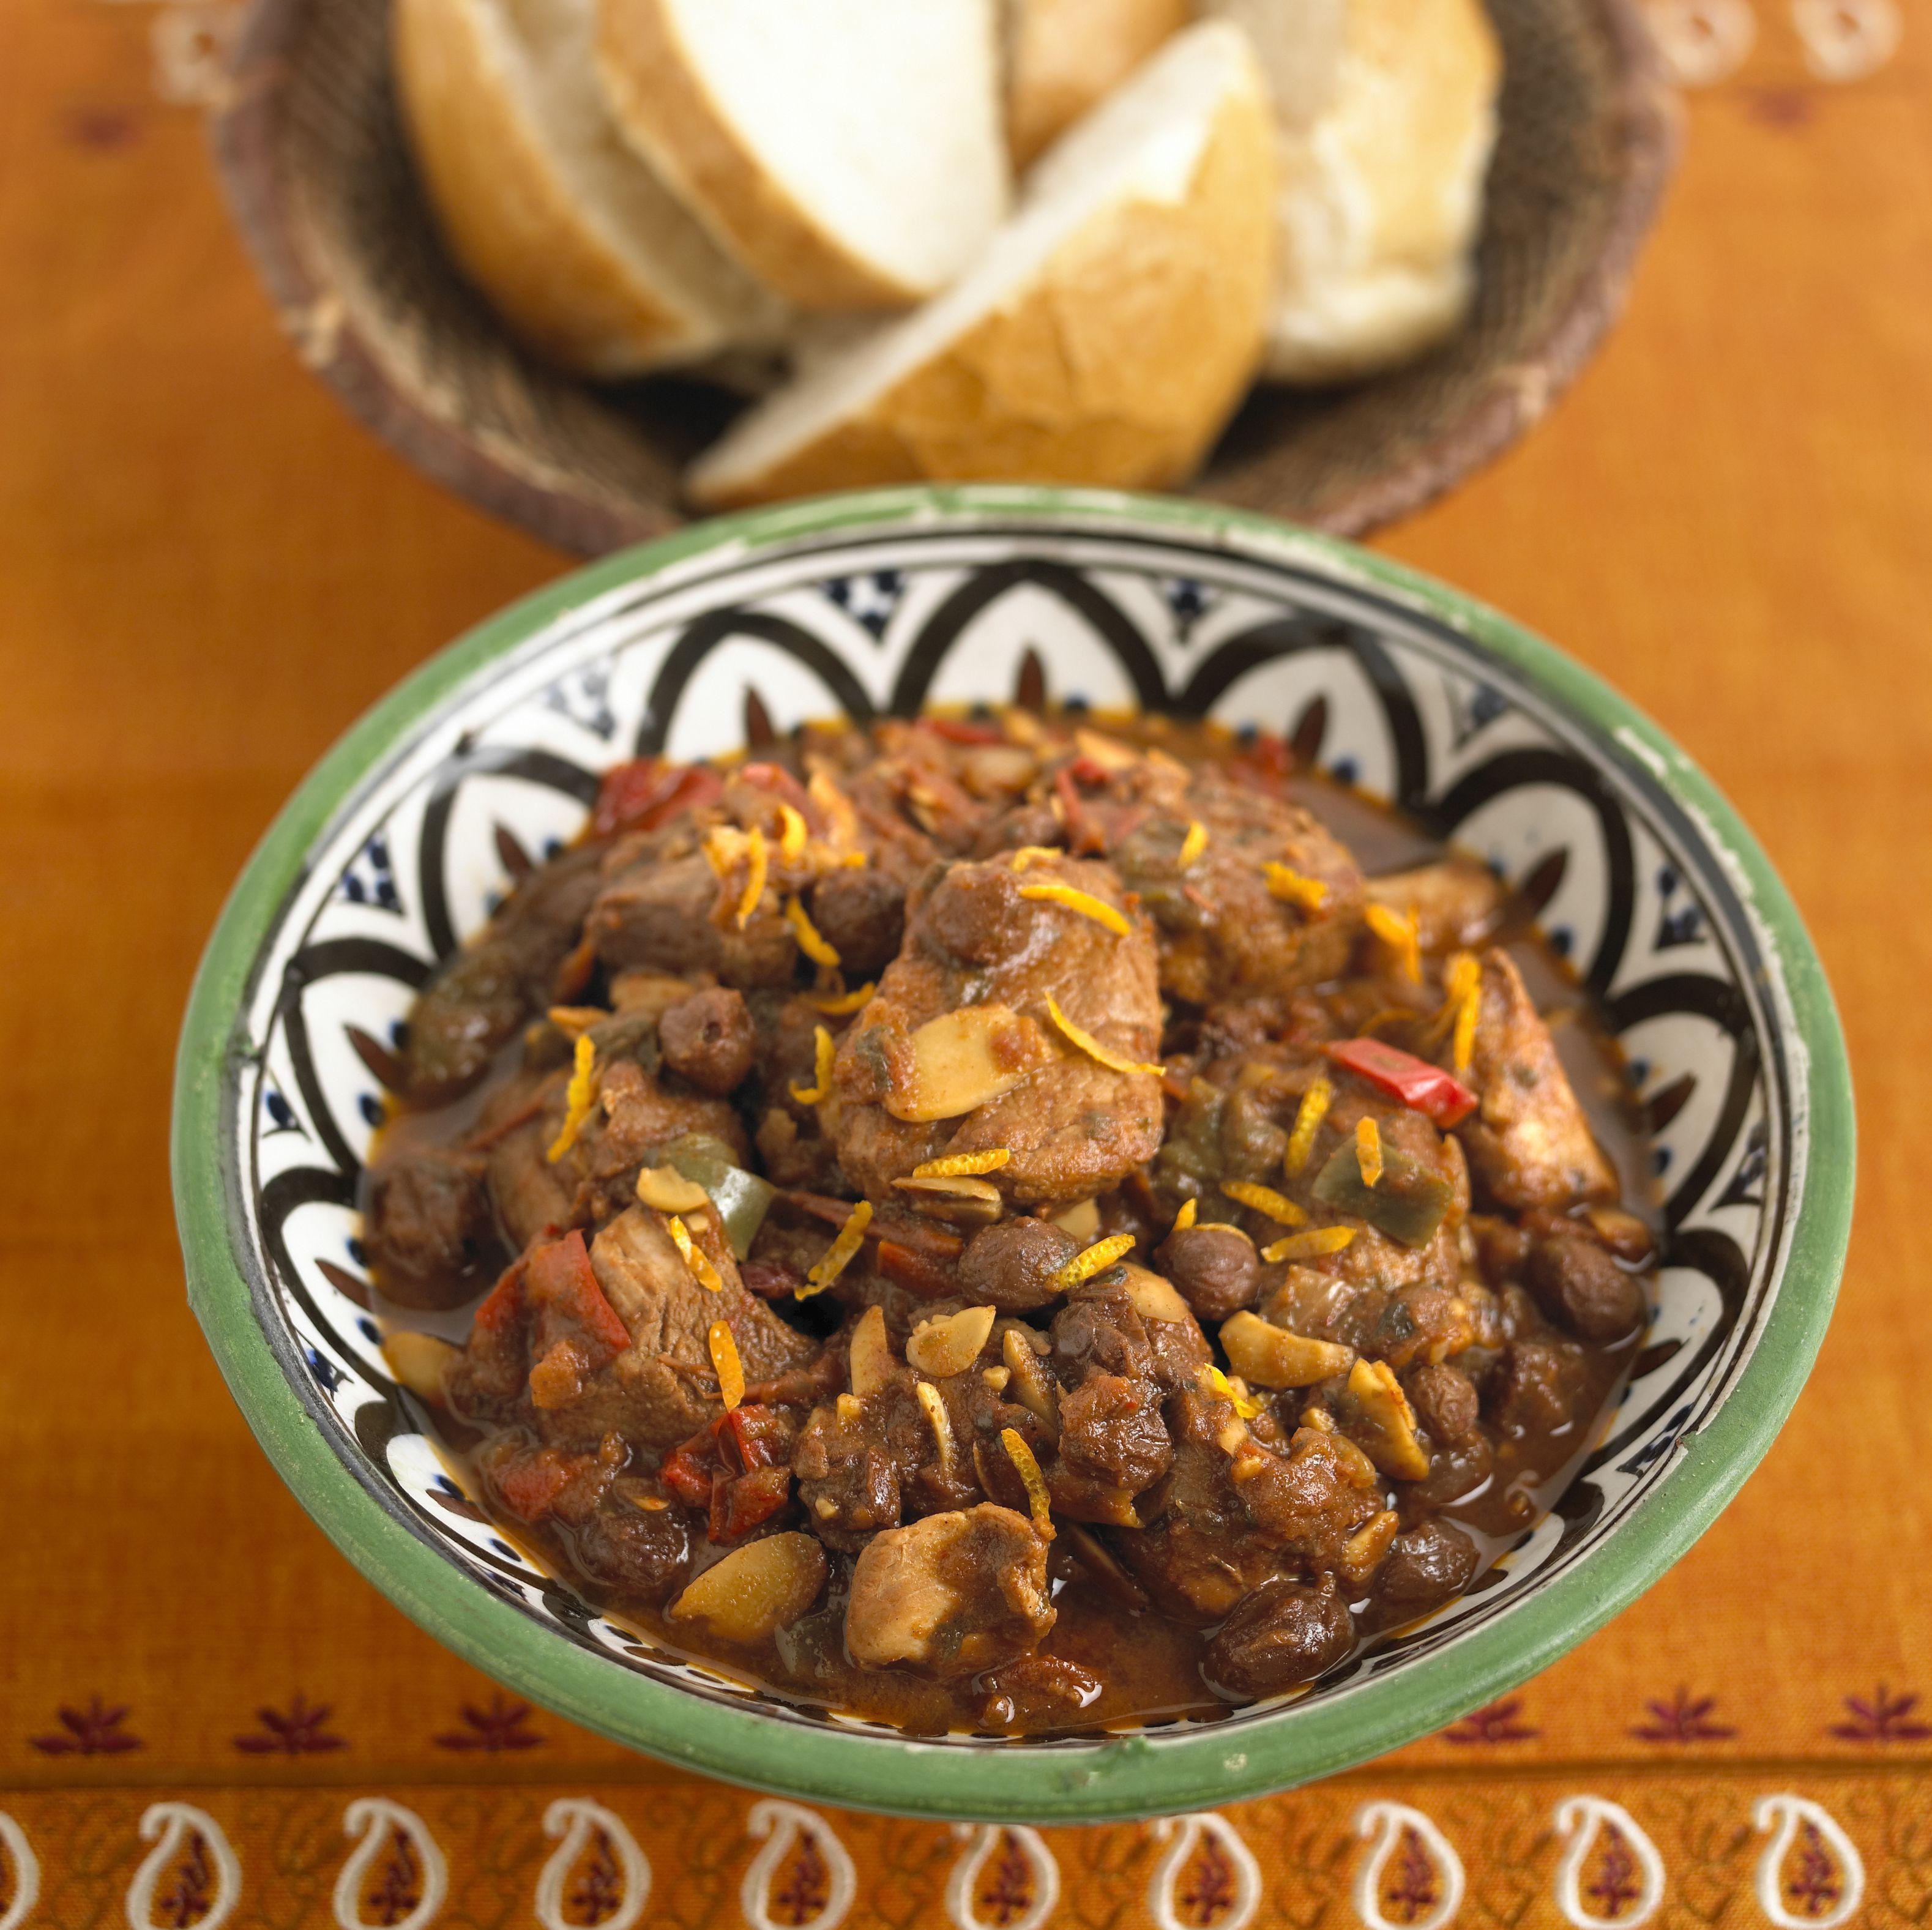 Easy Crock Pot Pork Chili Recipe